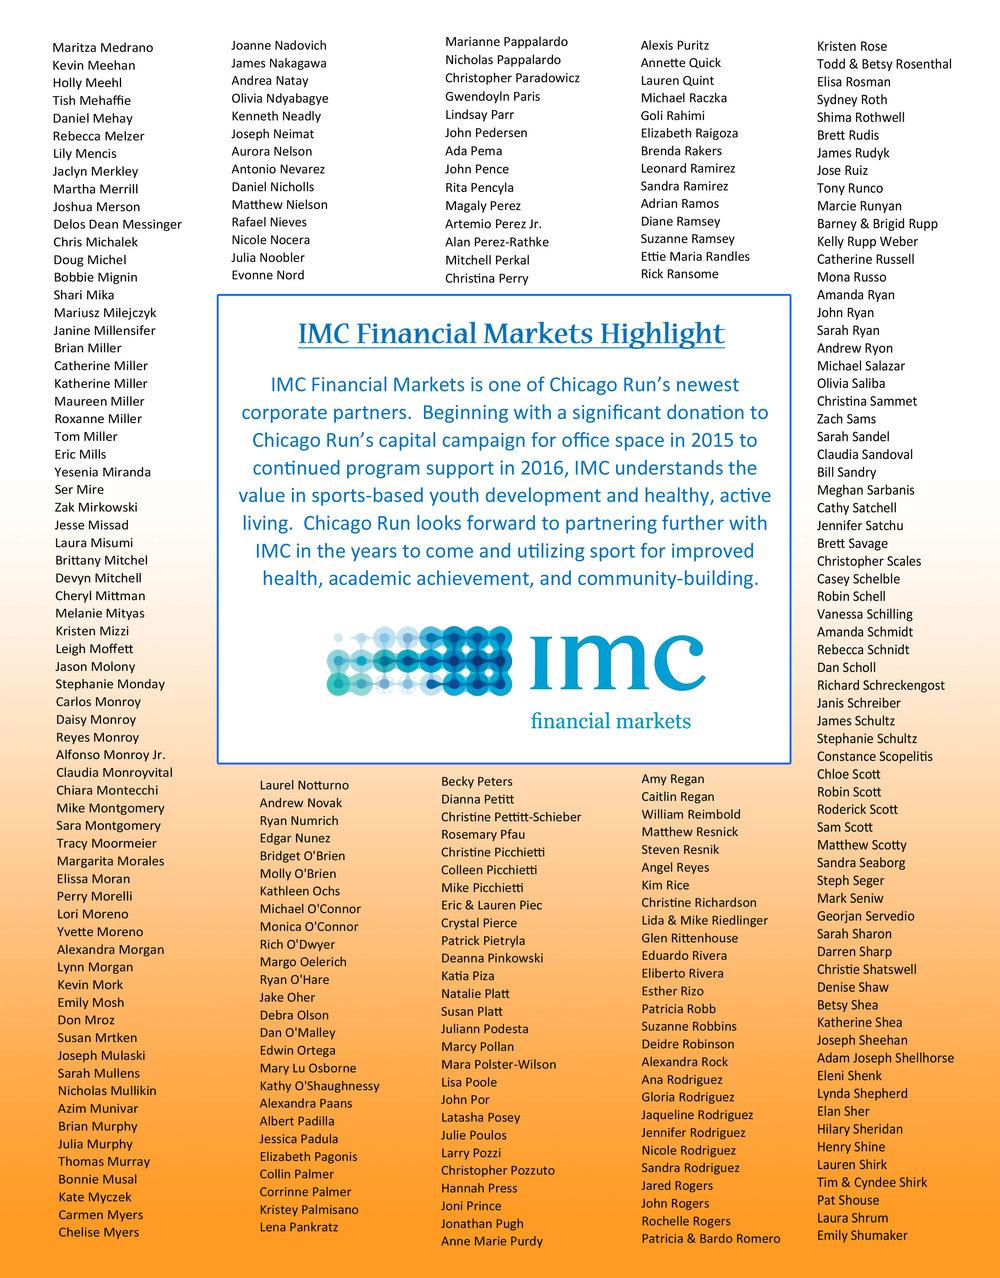 12 - Supporters (IMC highlight).jpg